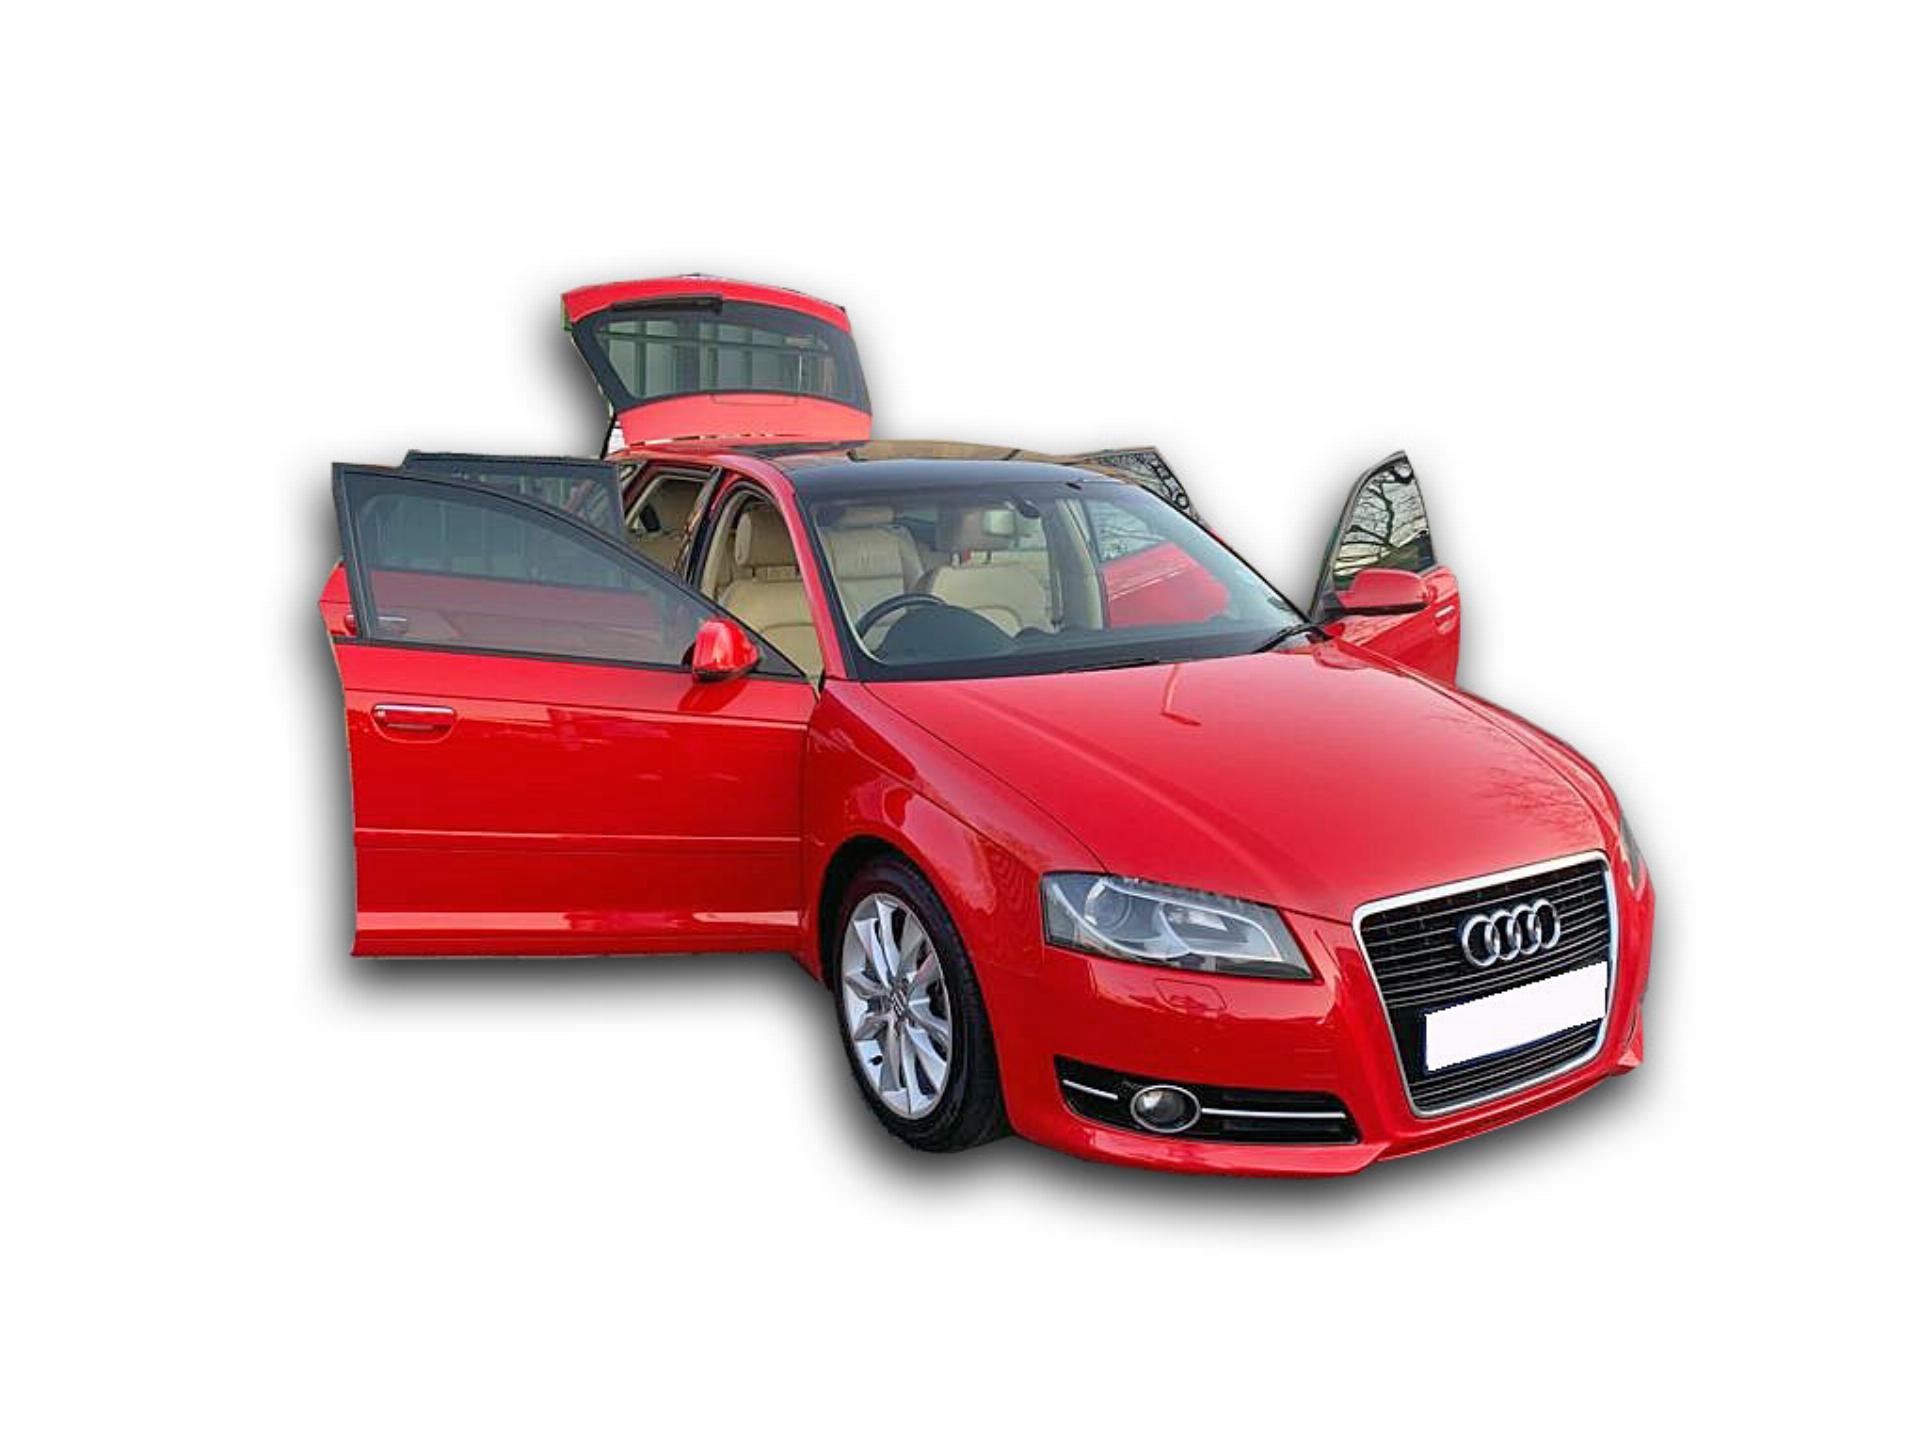 Audi A3 1.8T Sportback